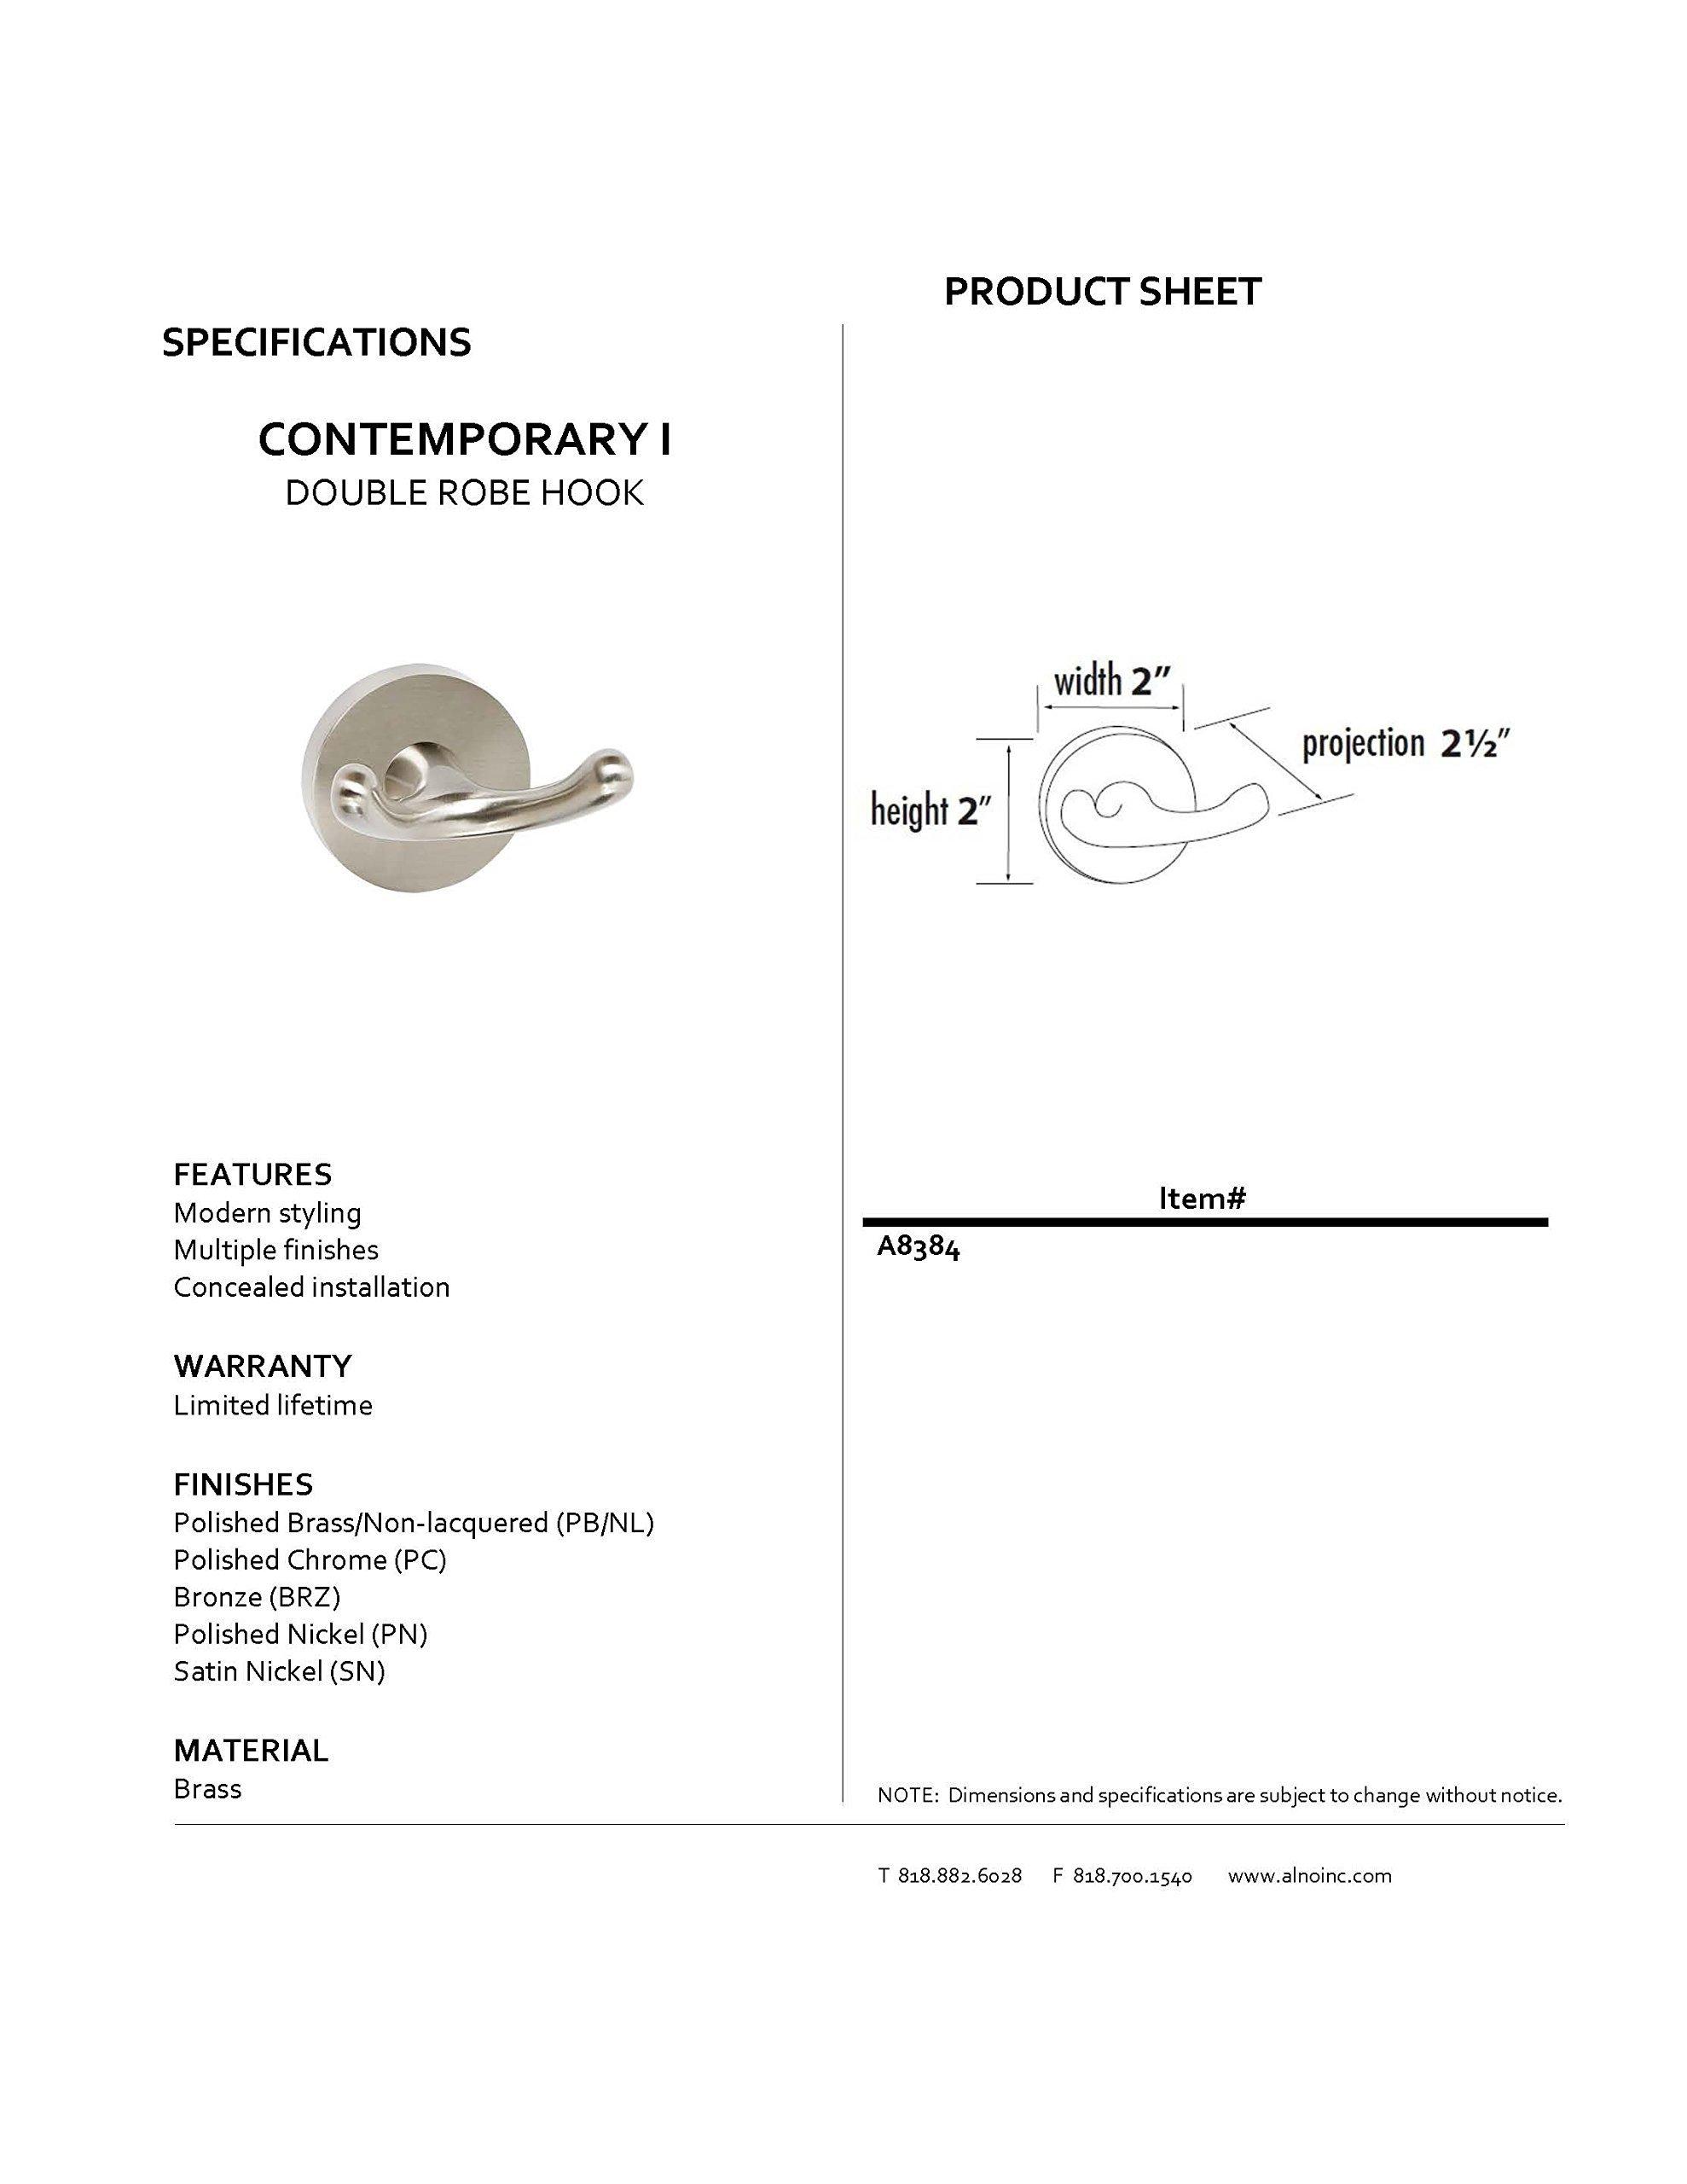 Alno A8384-PC Contemporary I Modern Robe Hooks, Polished Chrome